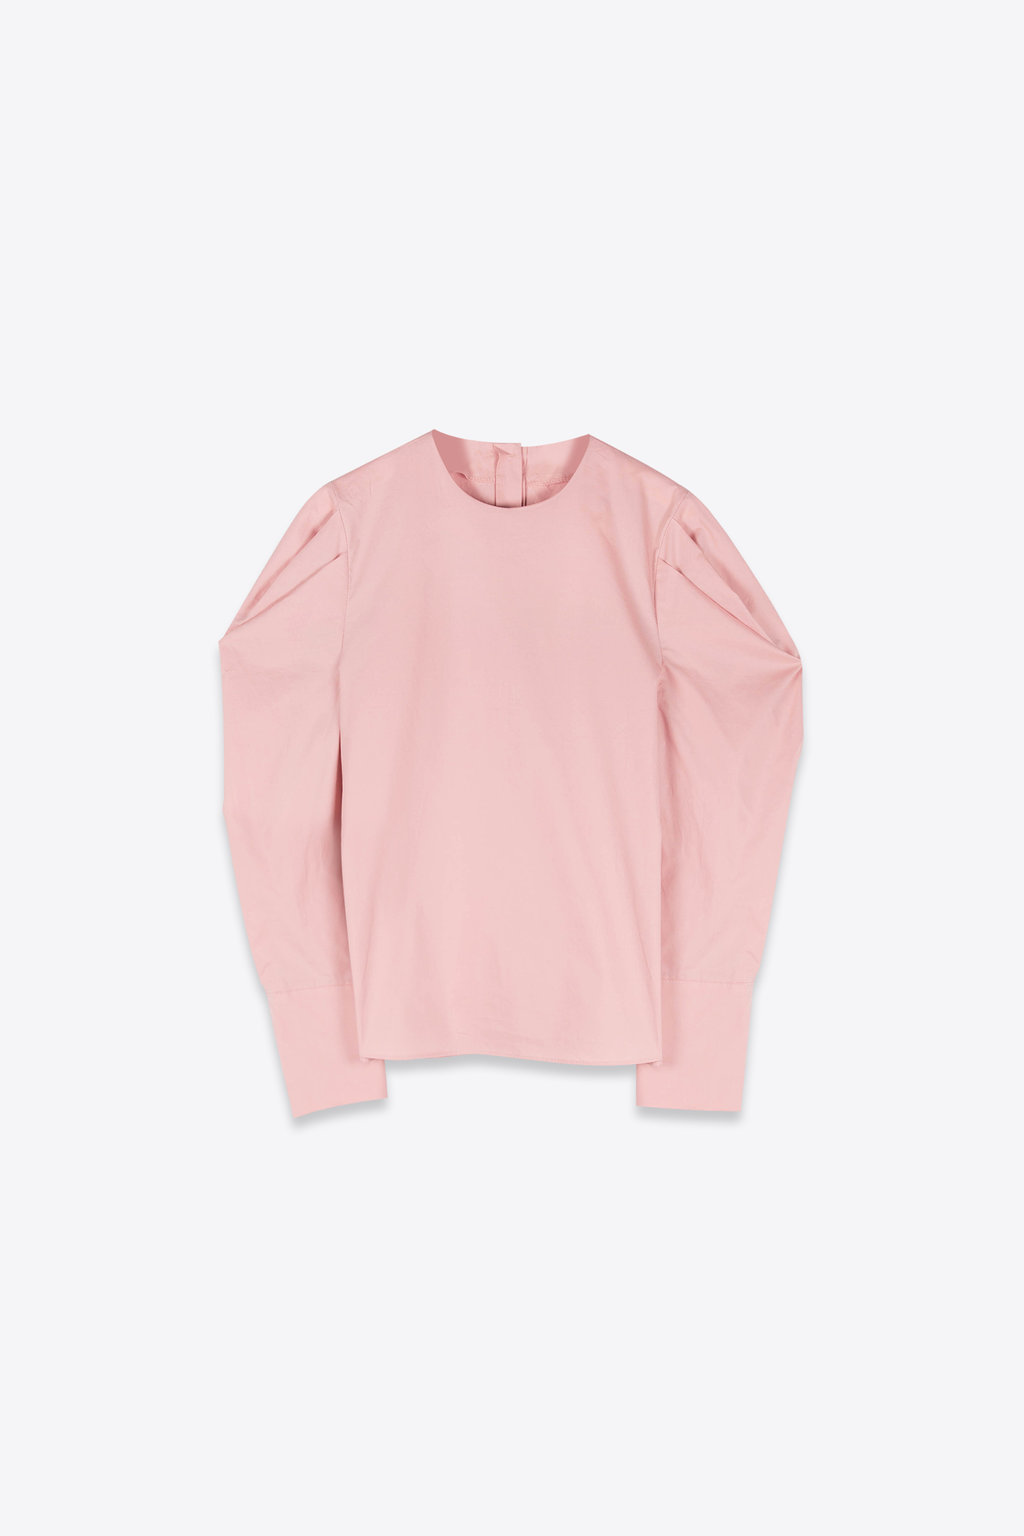 Blouse H002 Pink 7